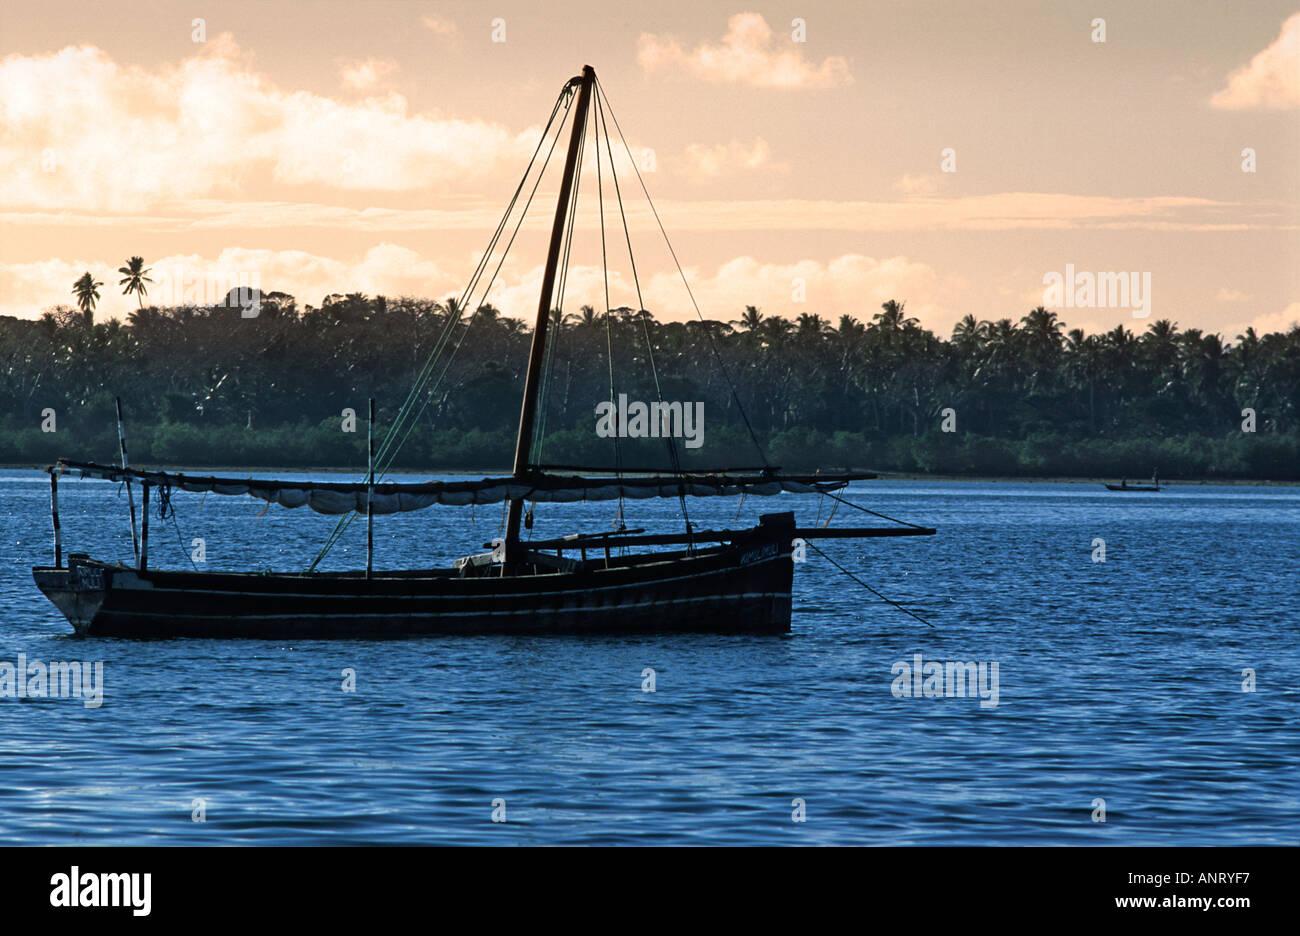 Dhow anchored at Utende in the straits between Chole and Mafia islands S of Zanzibar TANZANIA - Stock Image